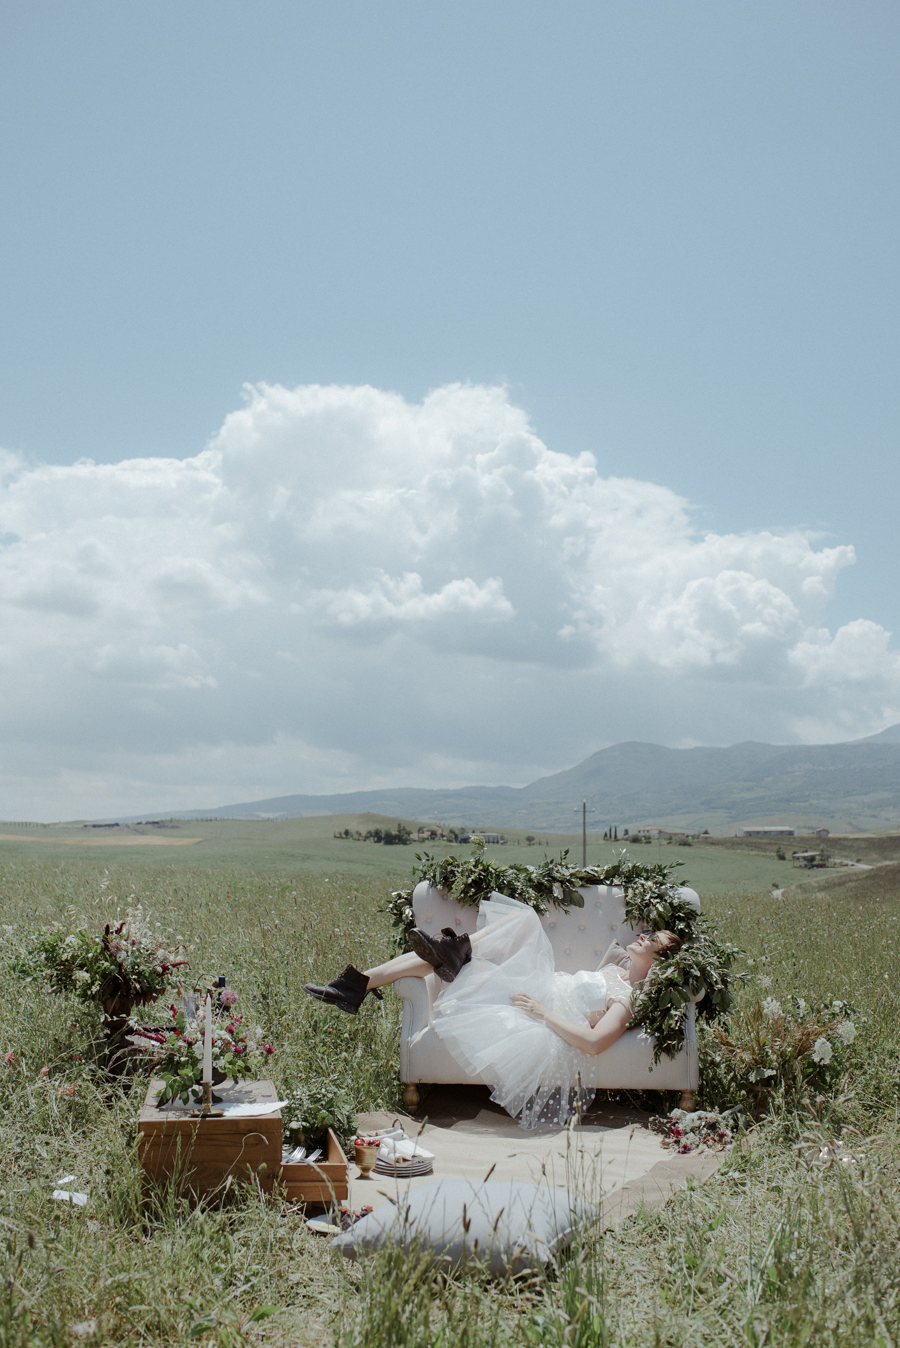 matrimonio-vintage-rock-fashion-politan-bianco-photography-11